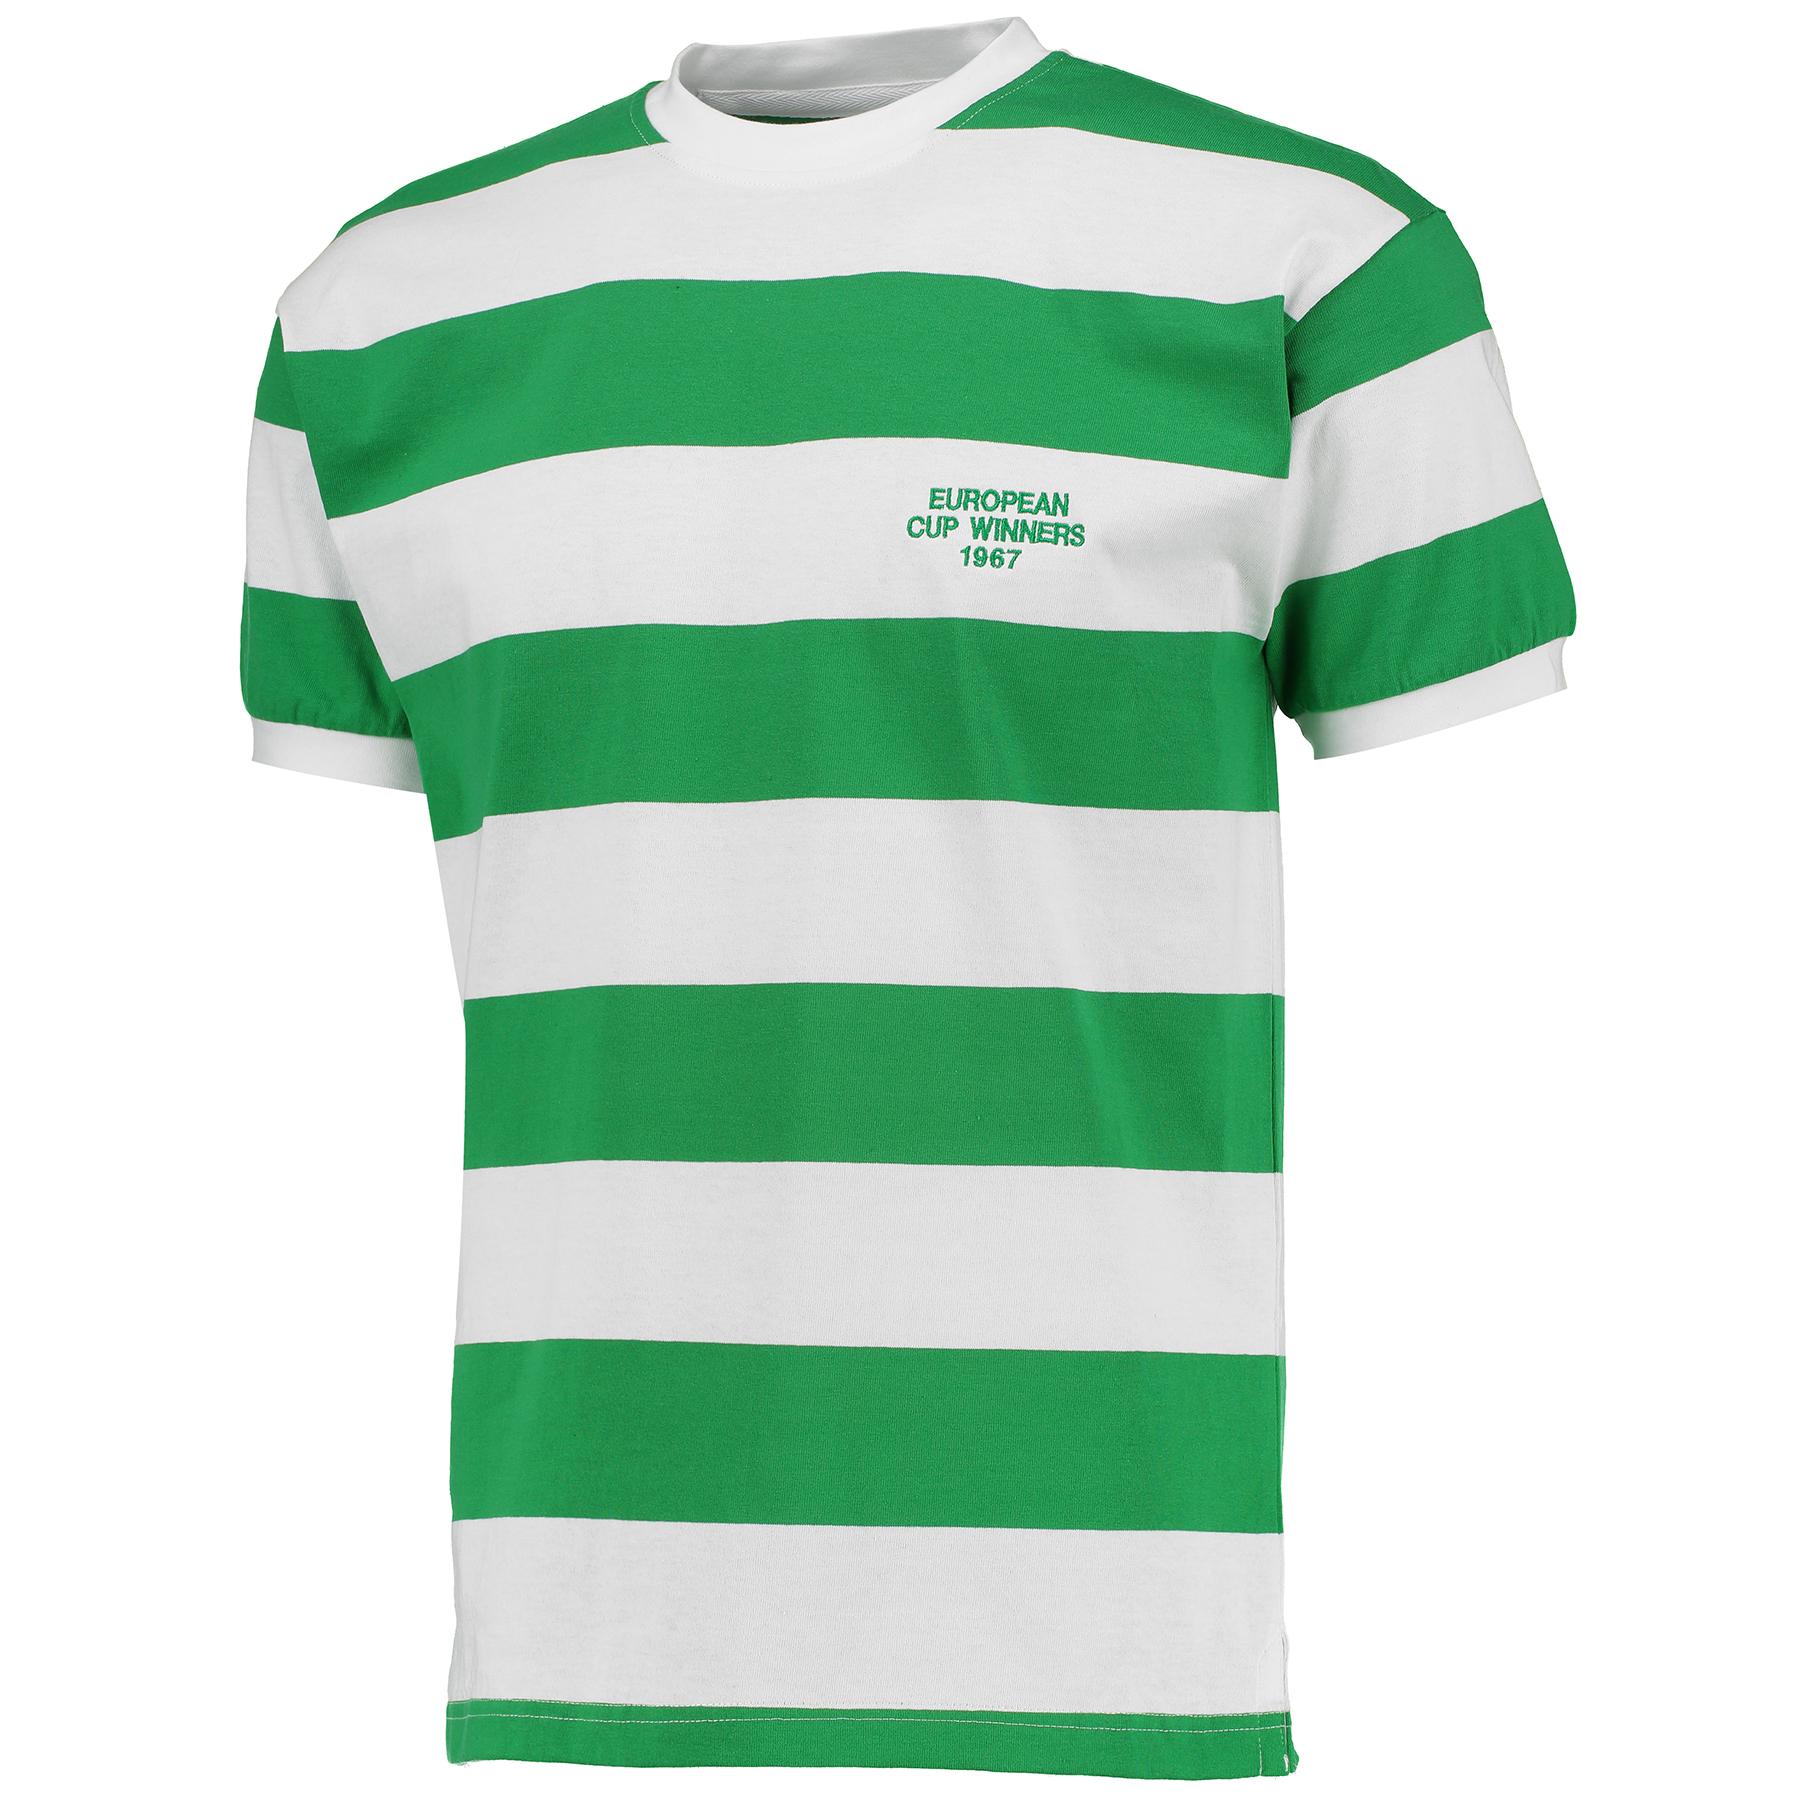 Celtic 1967 European Cup Winners shirt